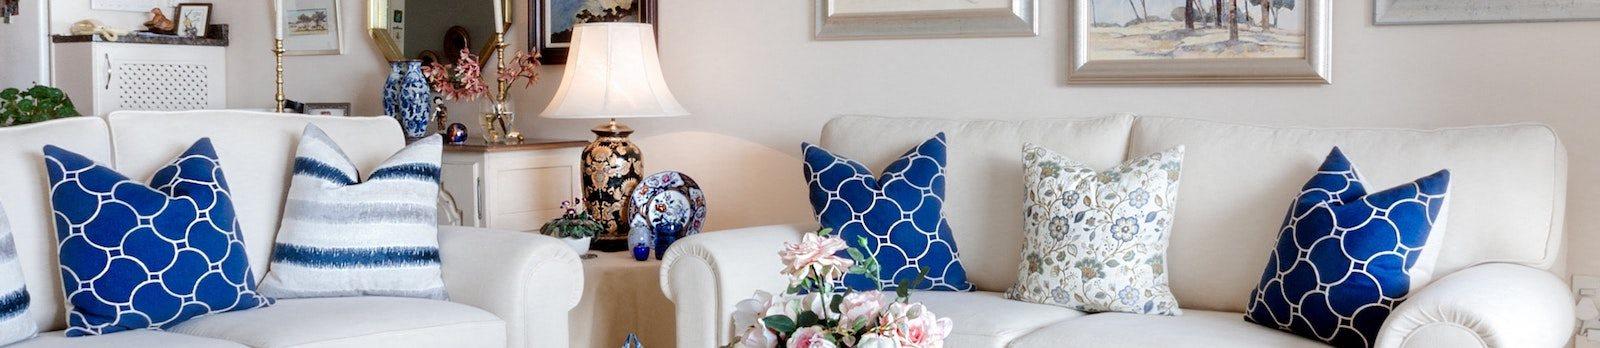 Villa San Carlos apartments in Port Charlotte, FL banner image